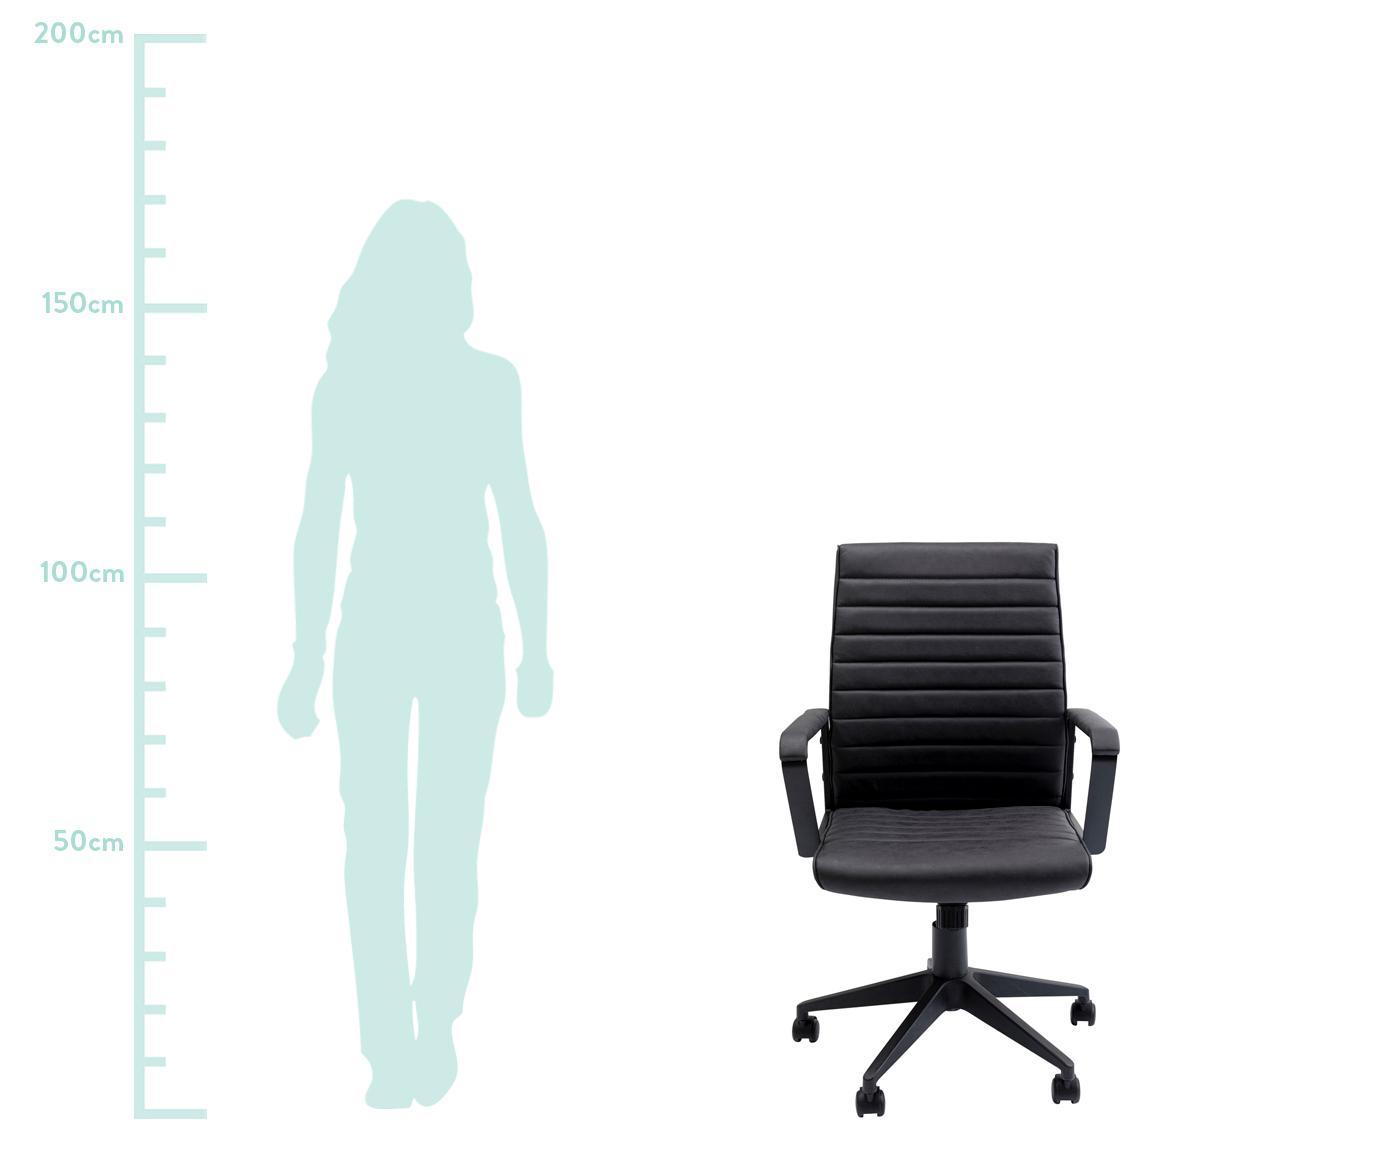 Kunstleder-Bürodrehstuhl Labora, Bezug: Kunstleder, Sitzschale: Pappelholz, massiv, natur, Schwarz, 57 x 105 cm